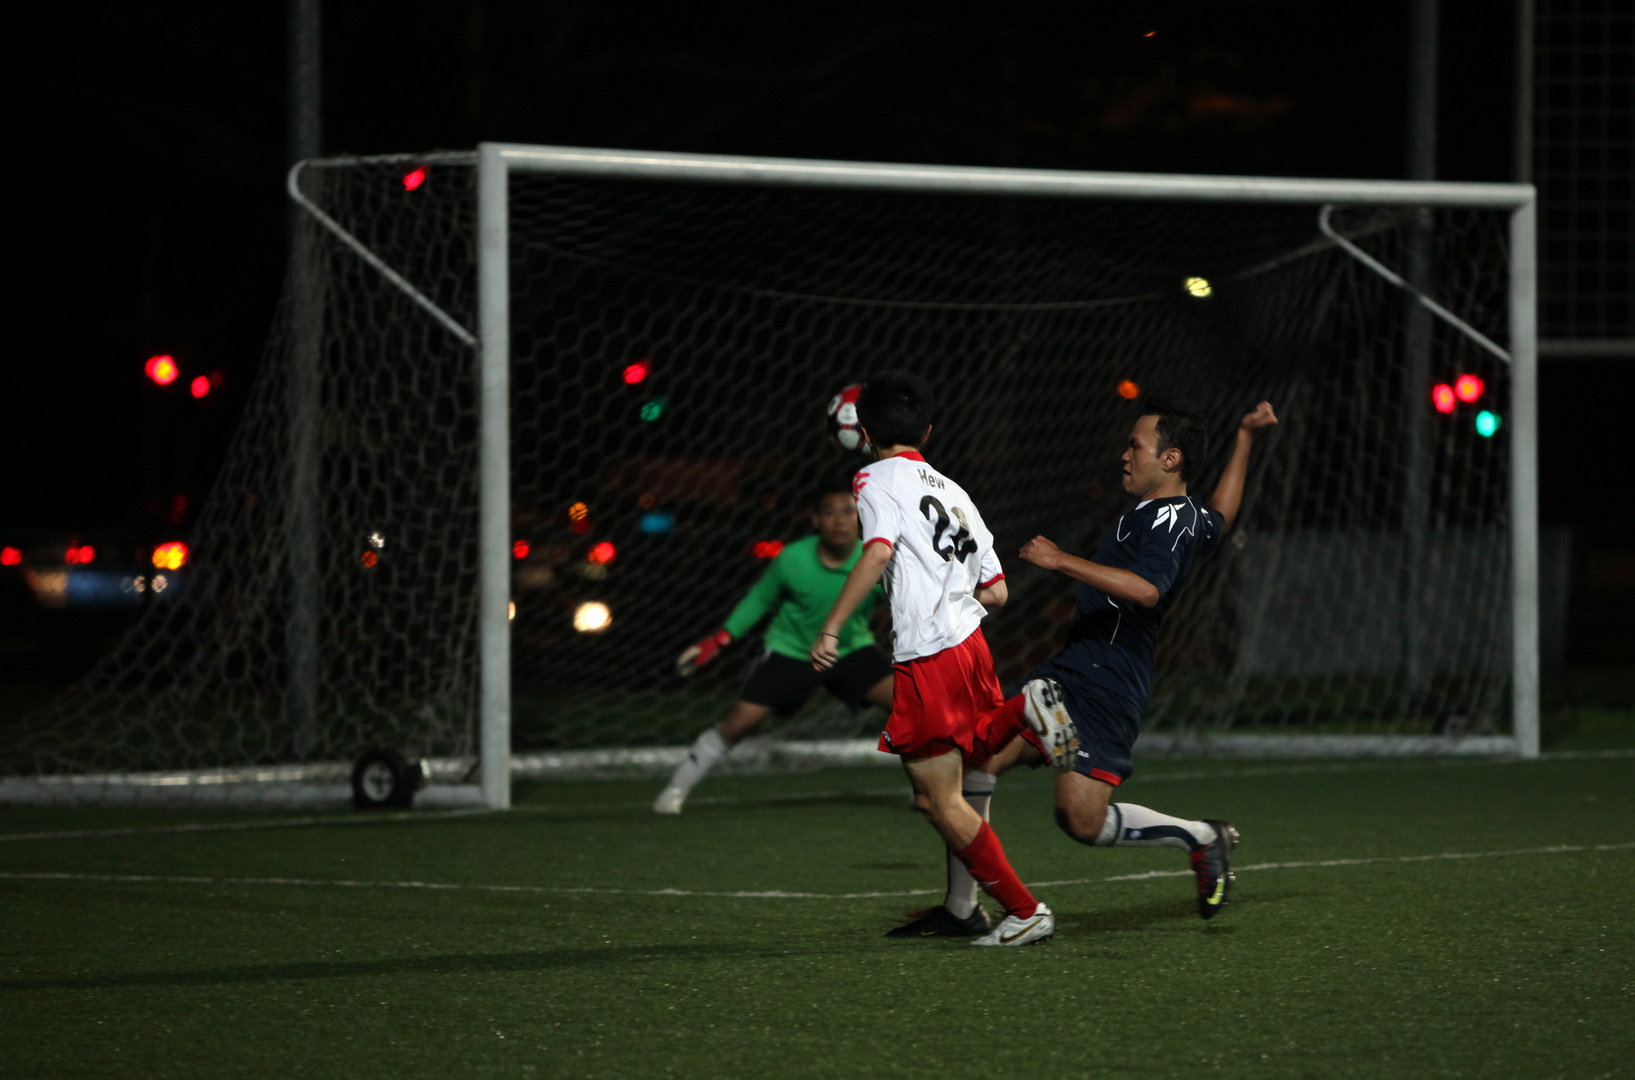 football7.jpg